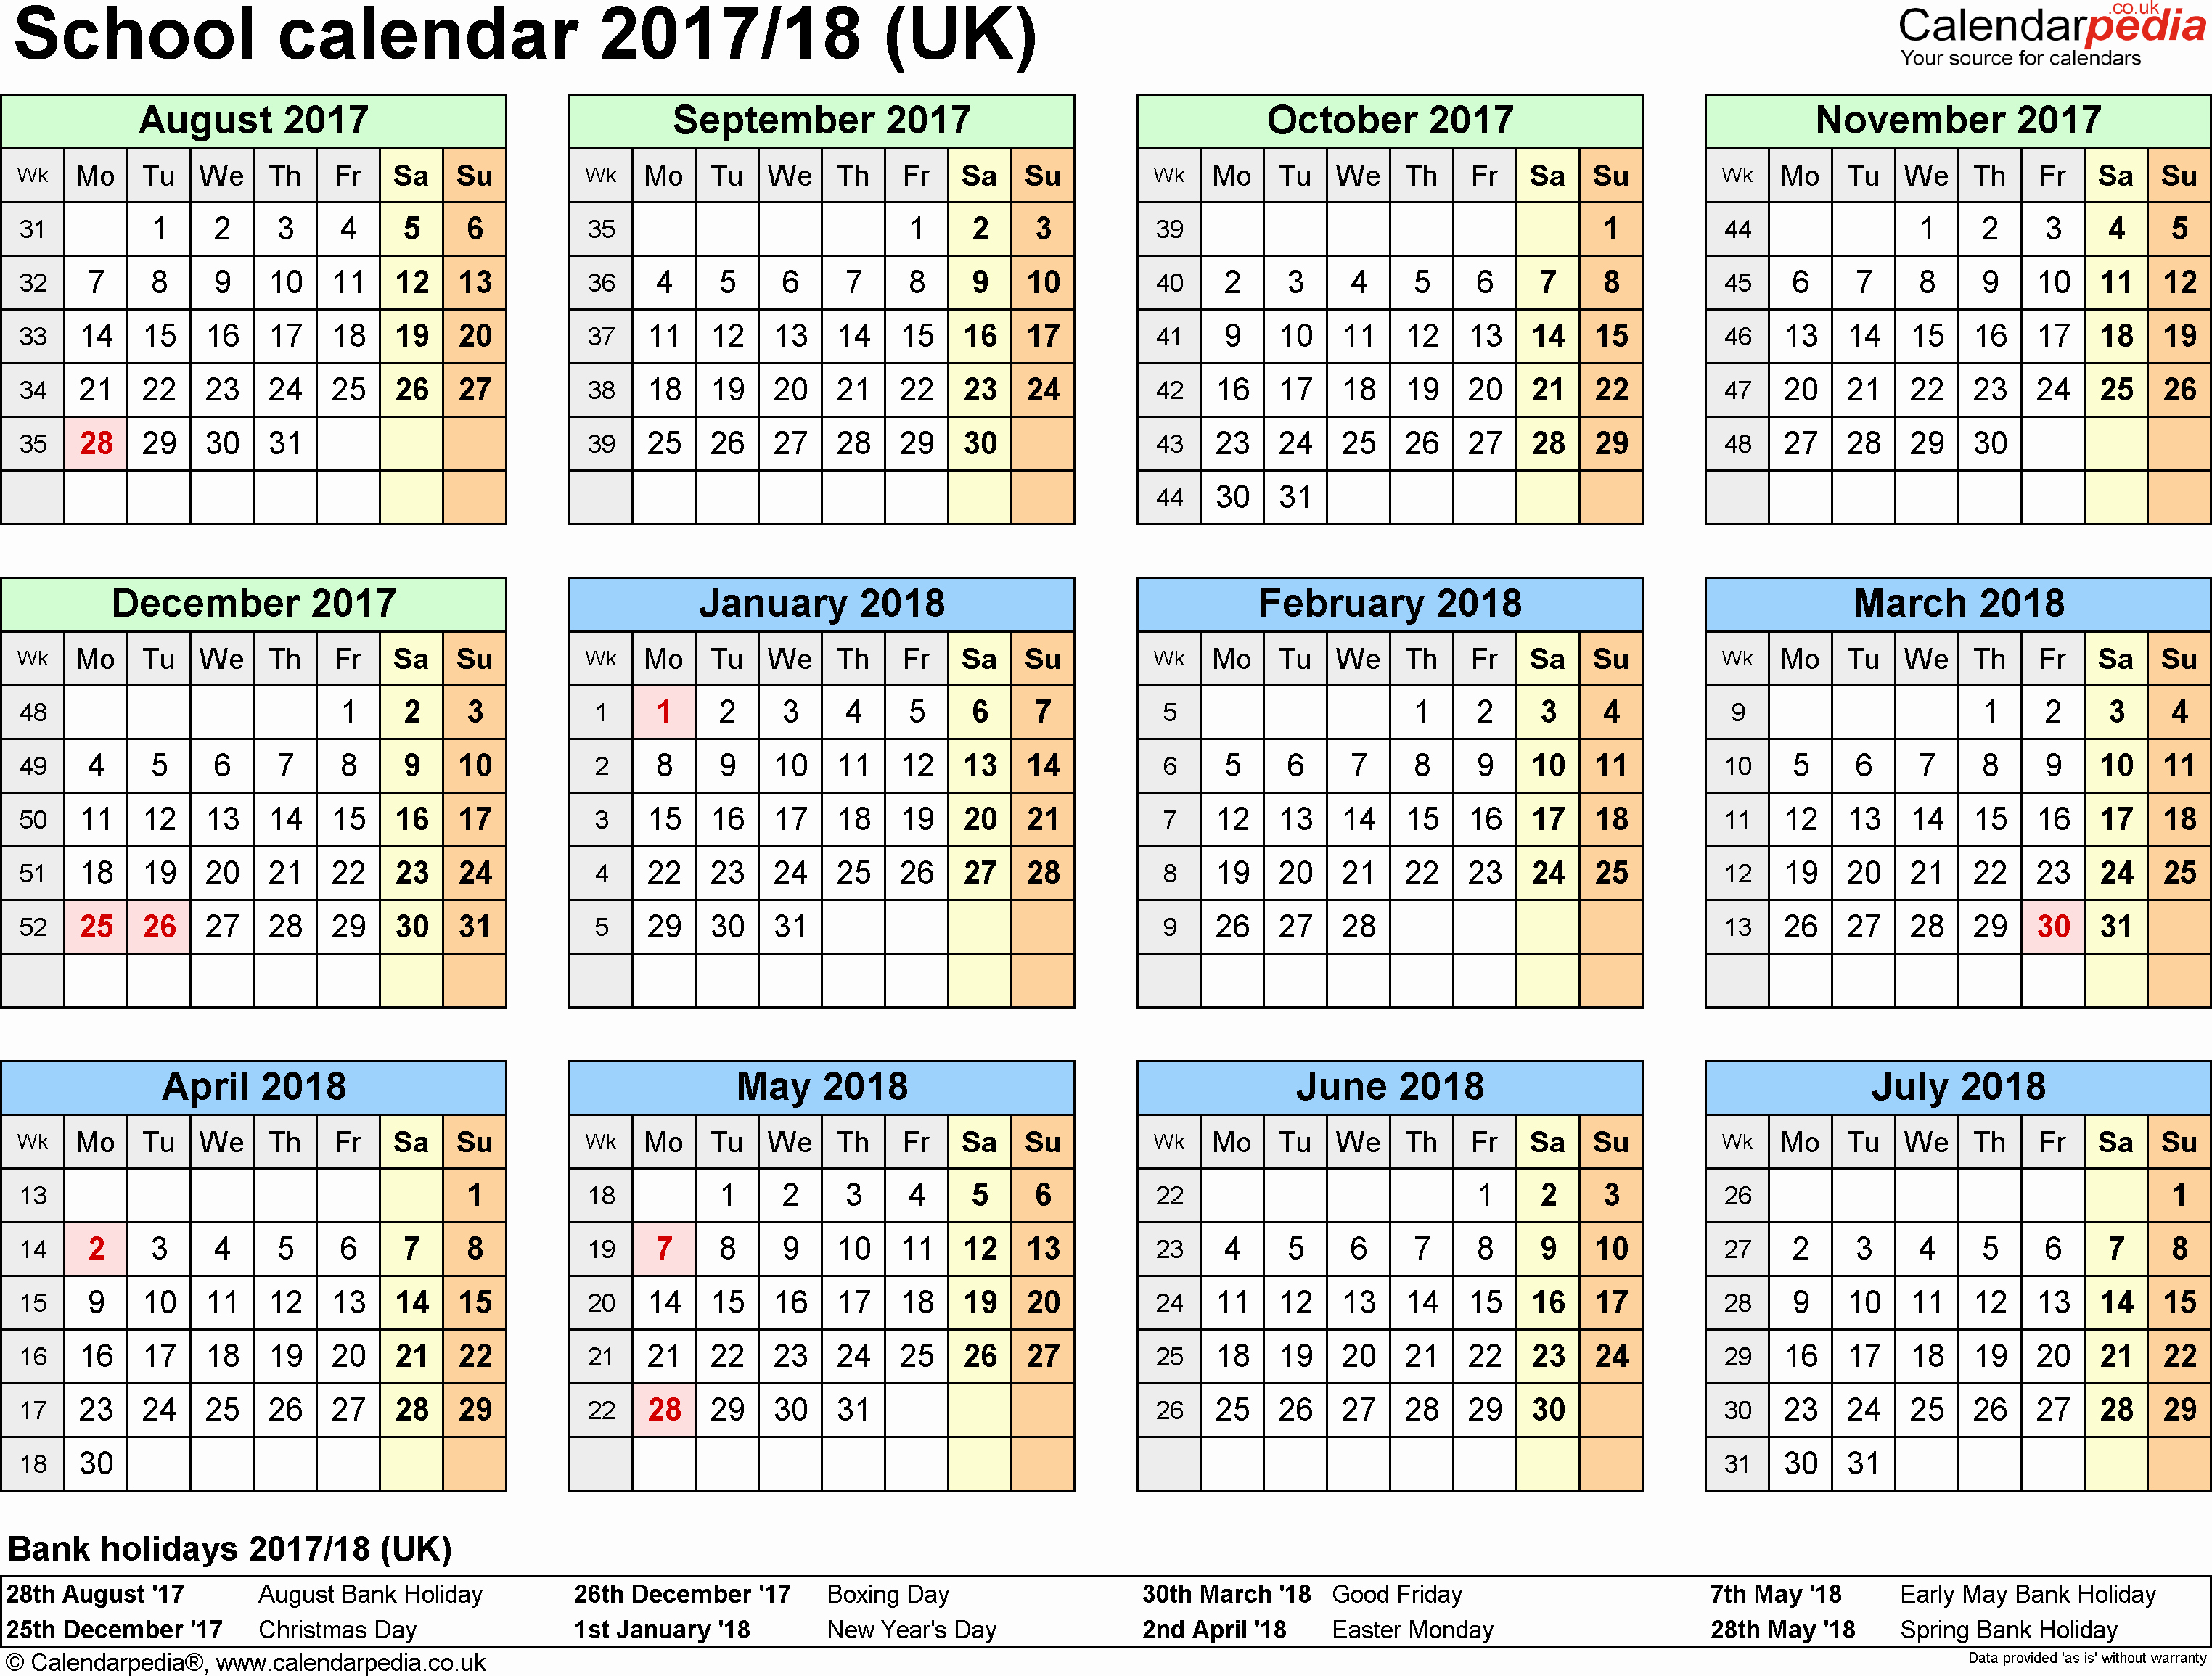 School Calendar 2018 19 Template Unique School Calendars 2017 2018 as Free Printable Pdf Templates